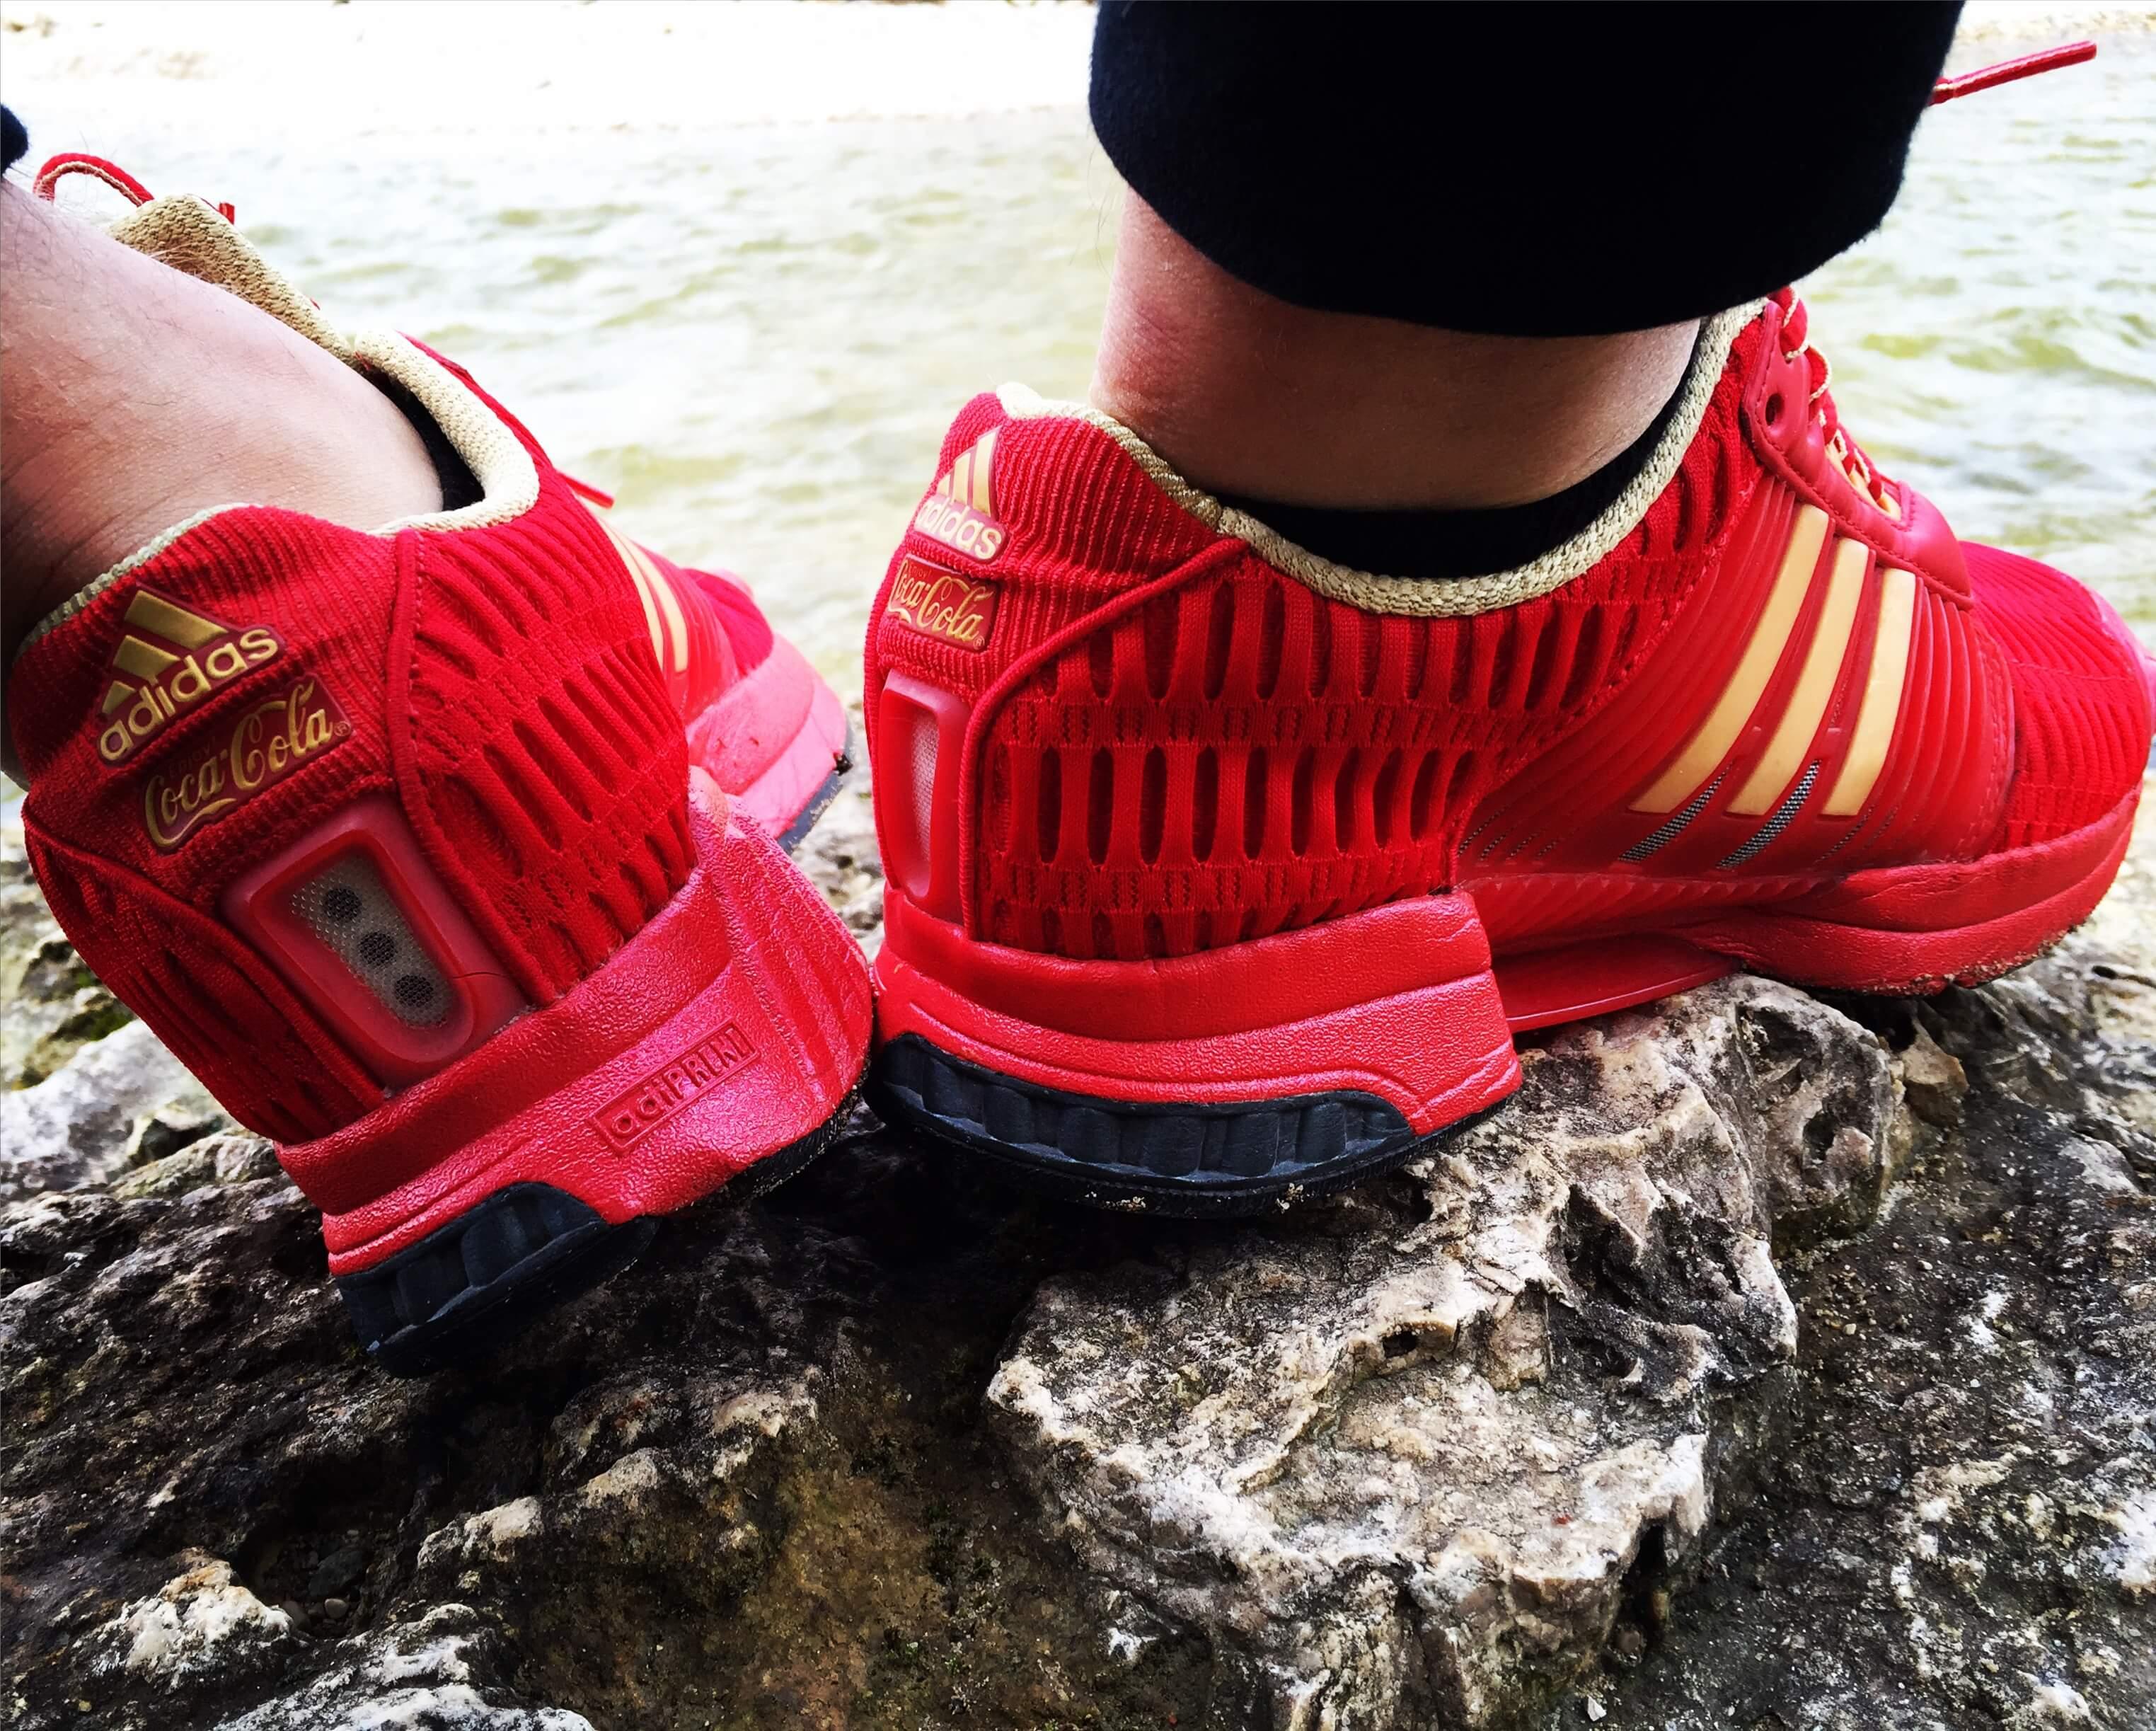 Adidas-ClimaCool-Coca-Cola-Rear-View-Benstah-Onfeet